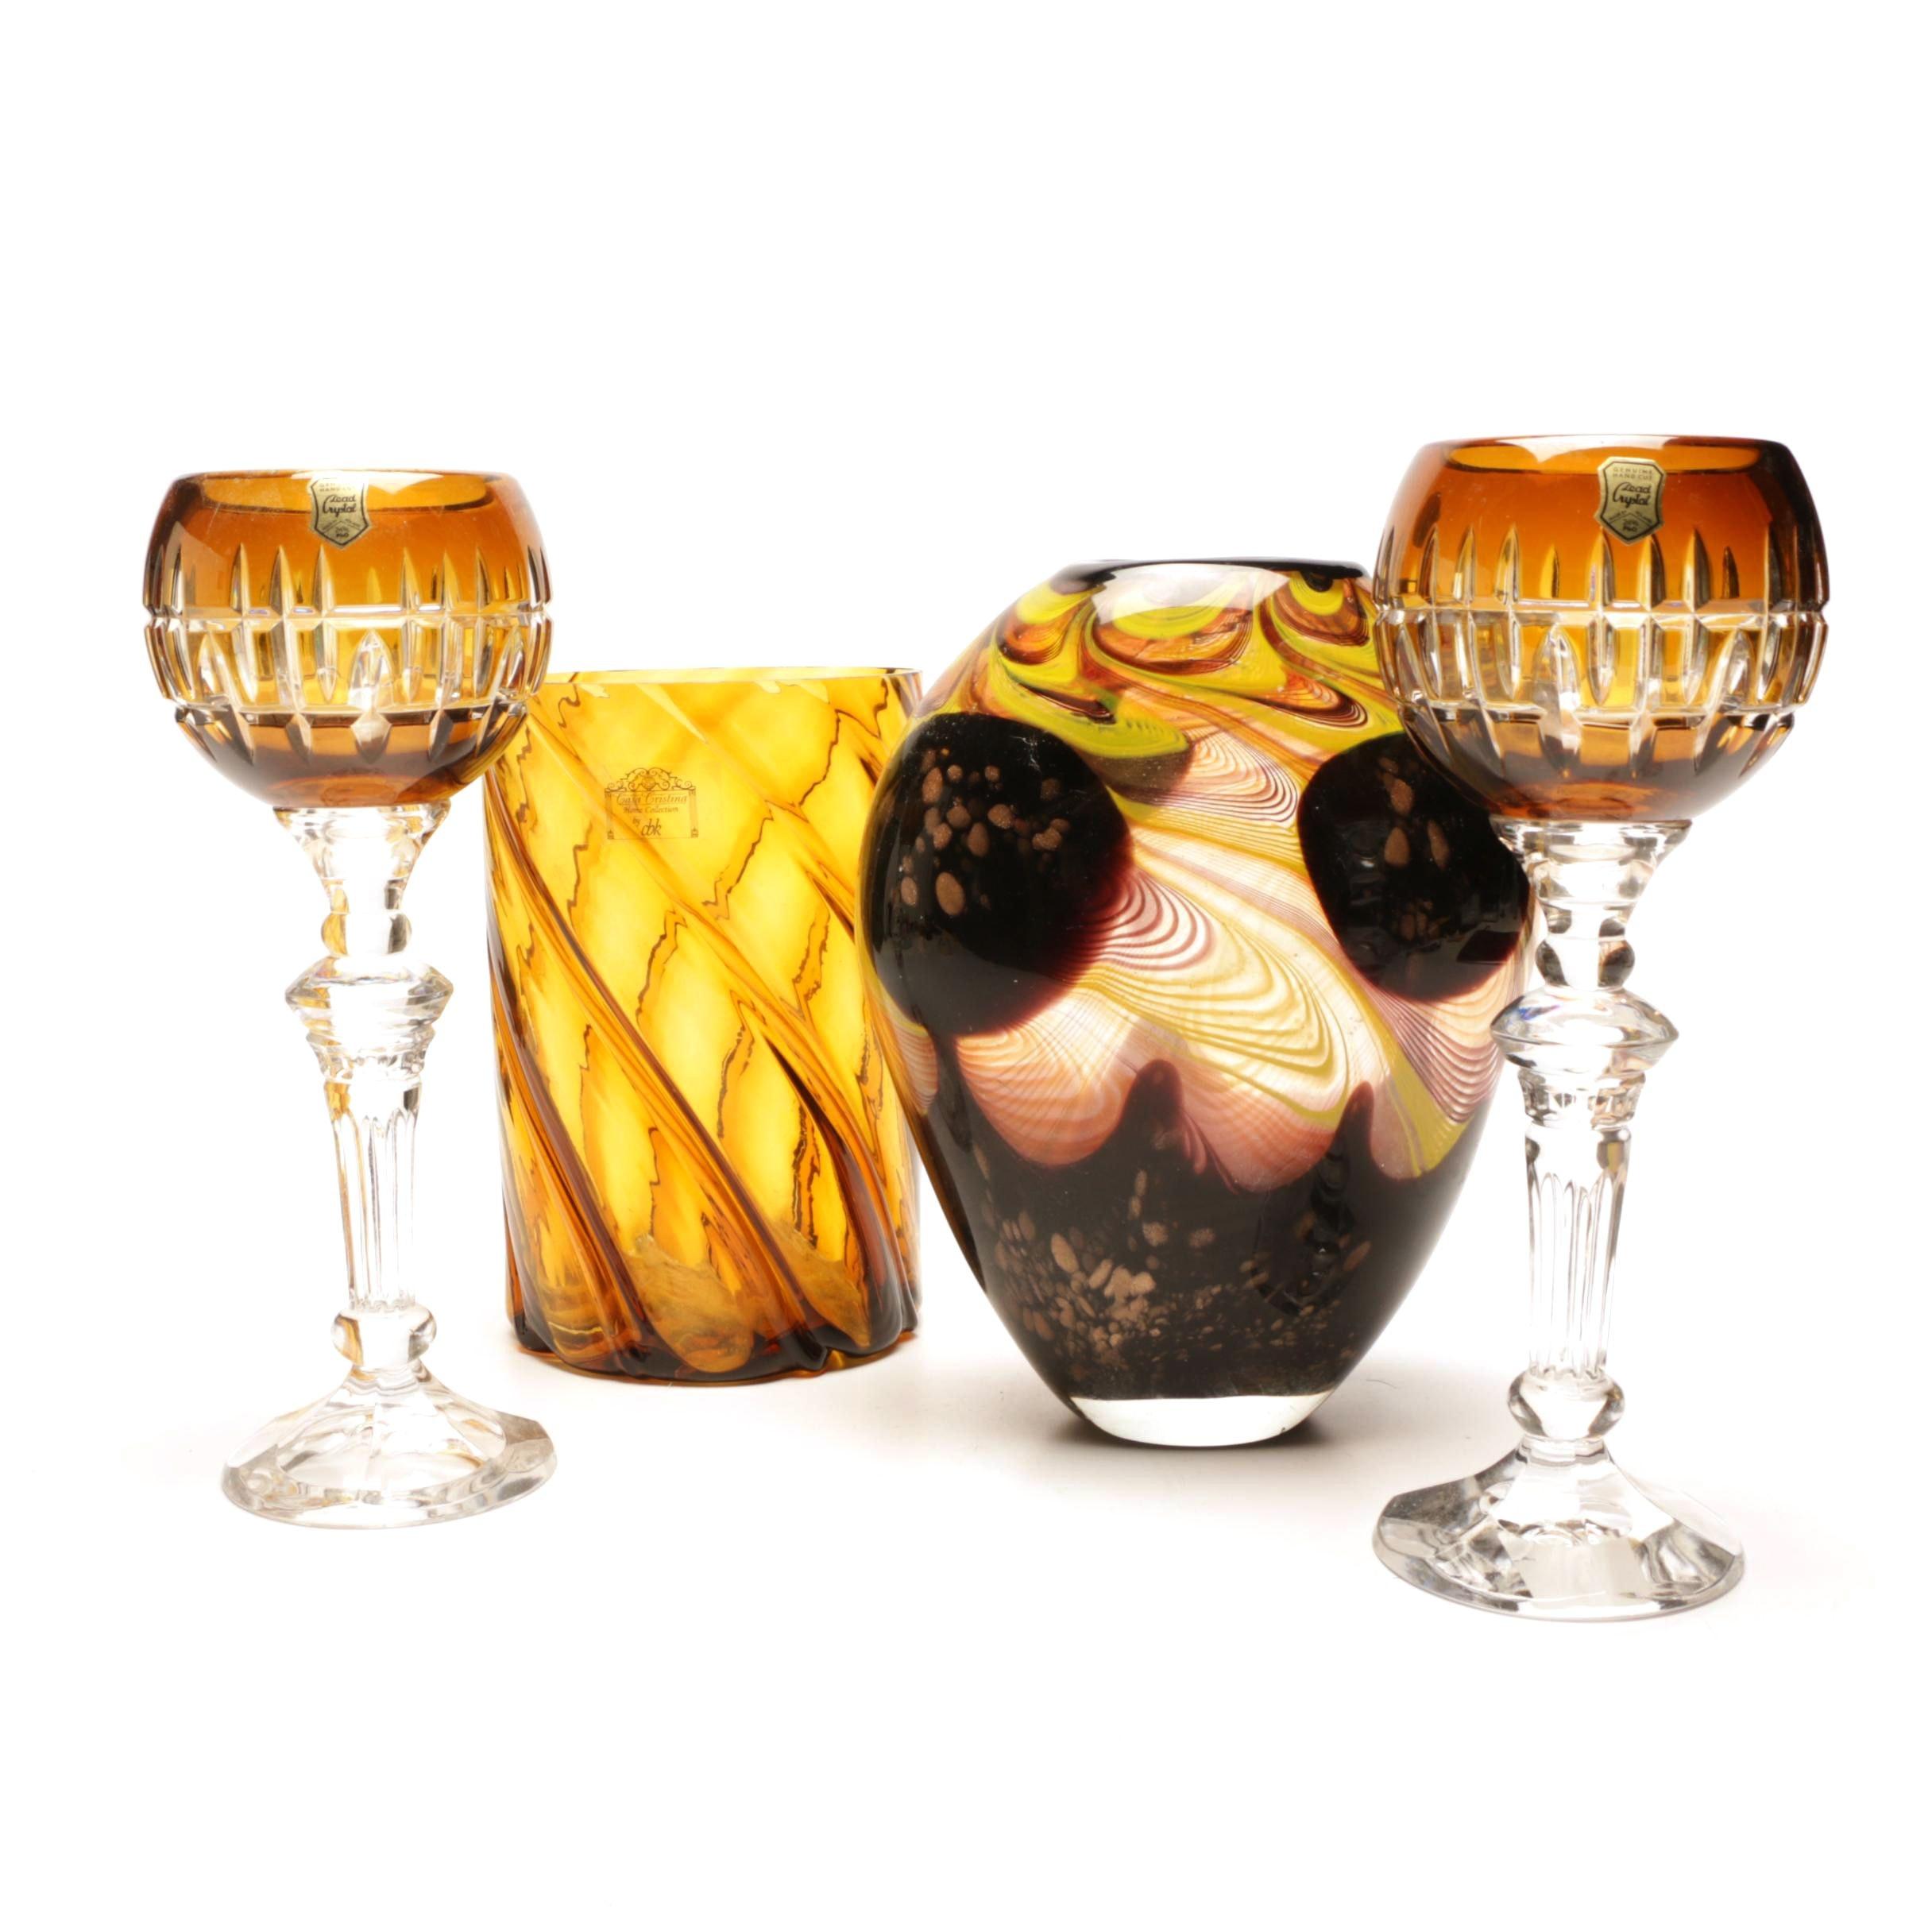 Lenox Swirled Glass Vase and Amber Toned Candle Holders